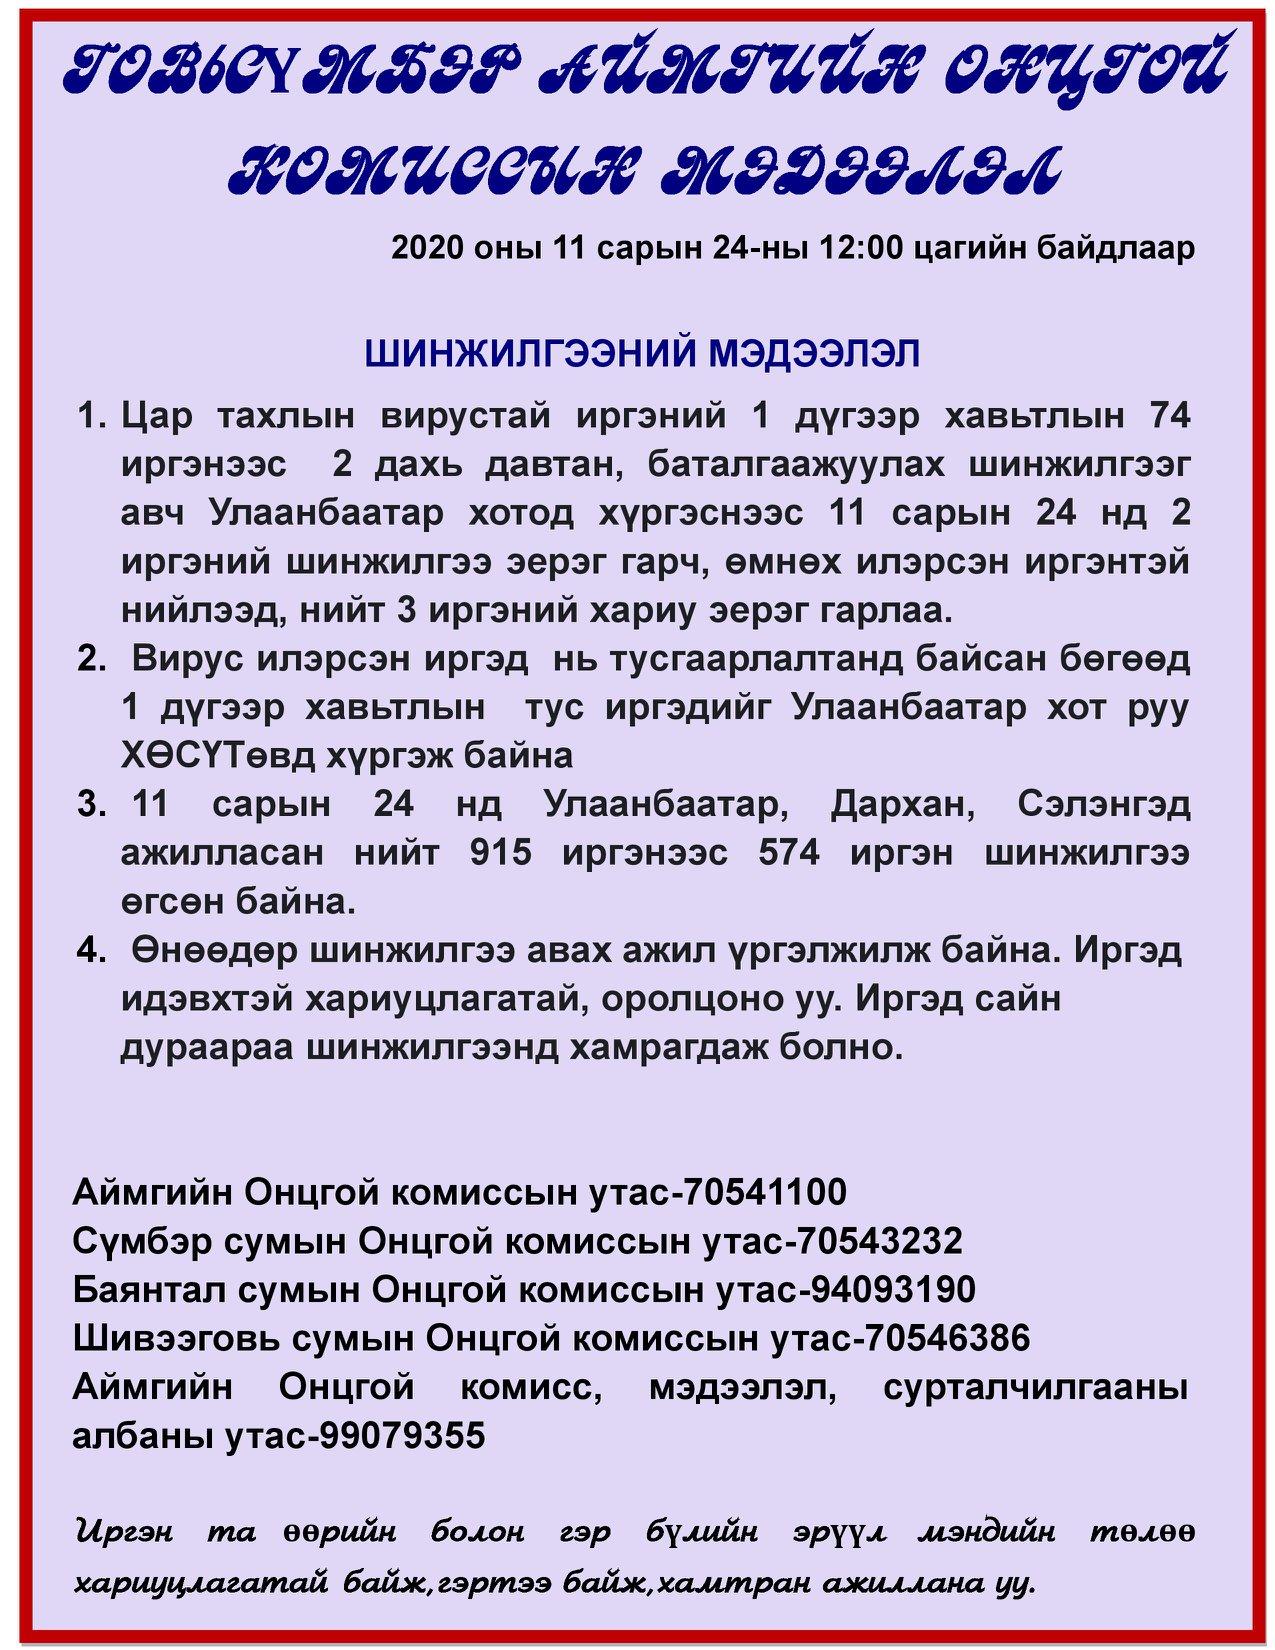 125806430_3263442143783217_7125737902749899045_o